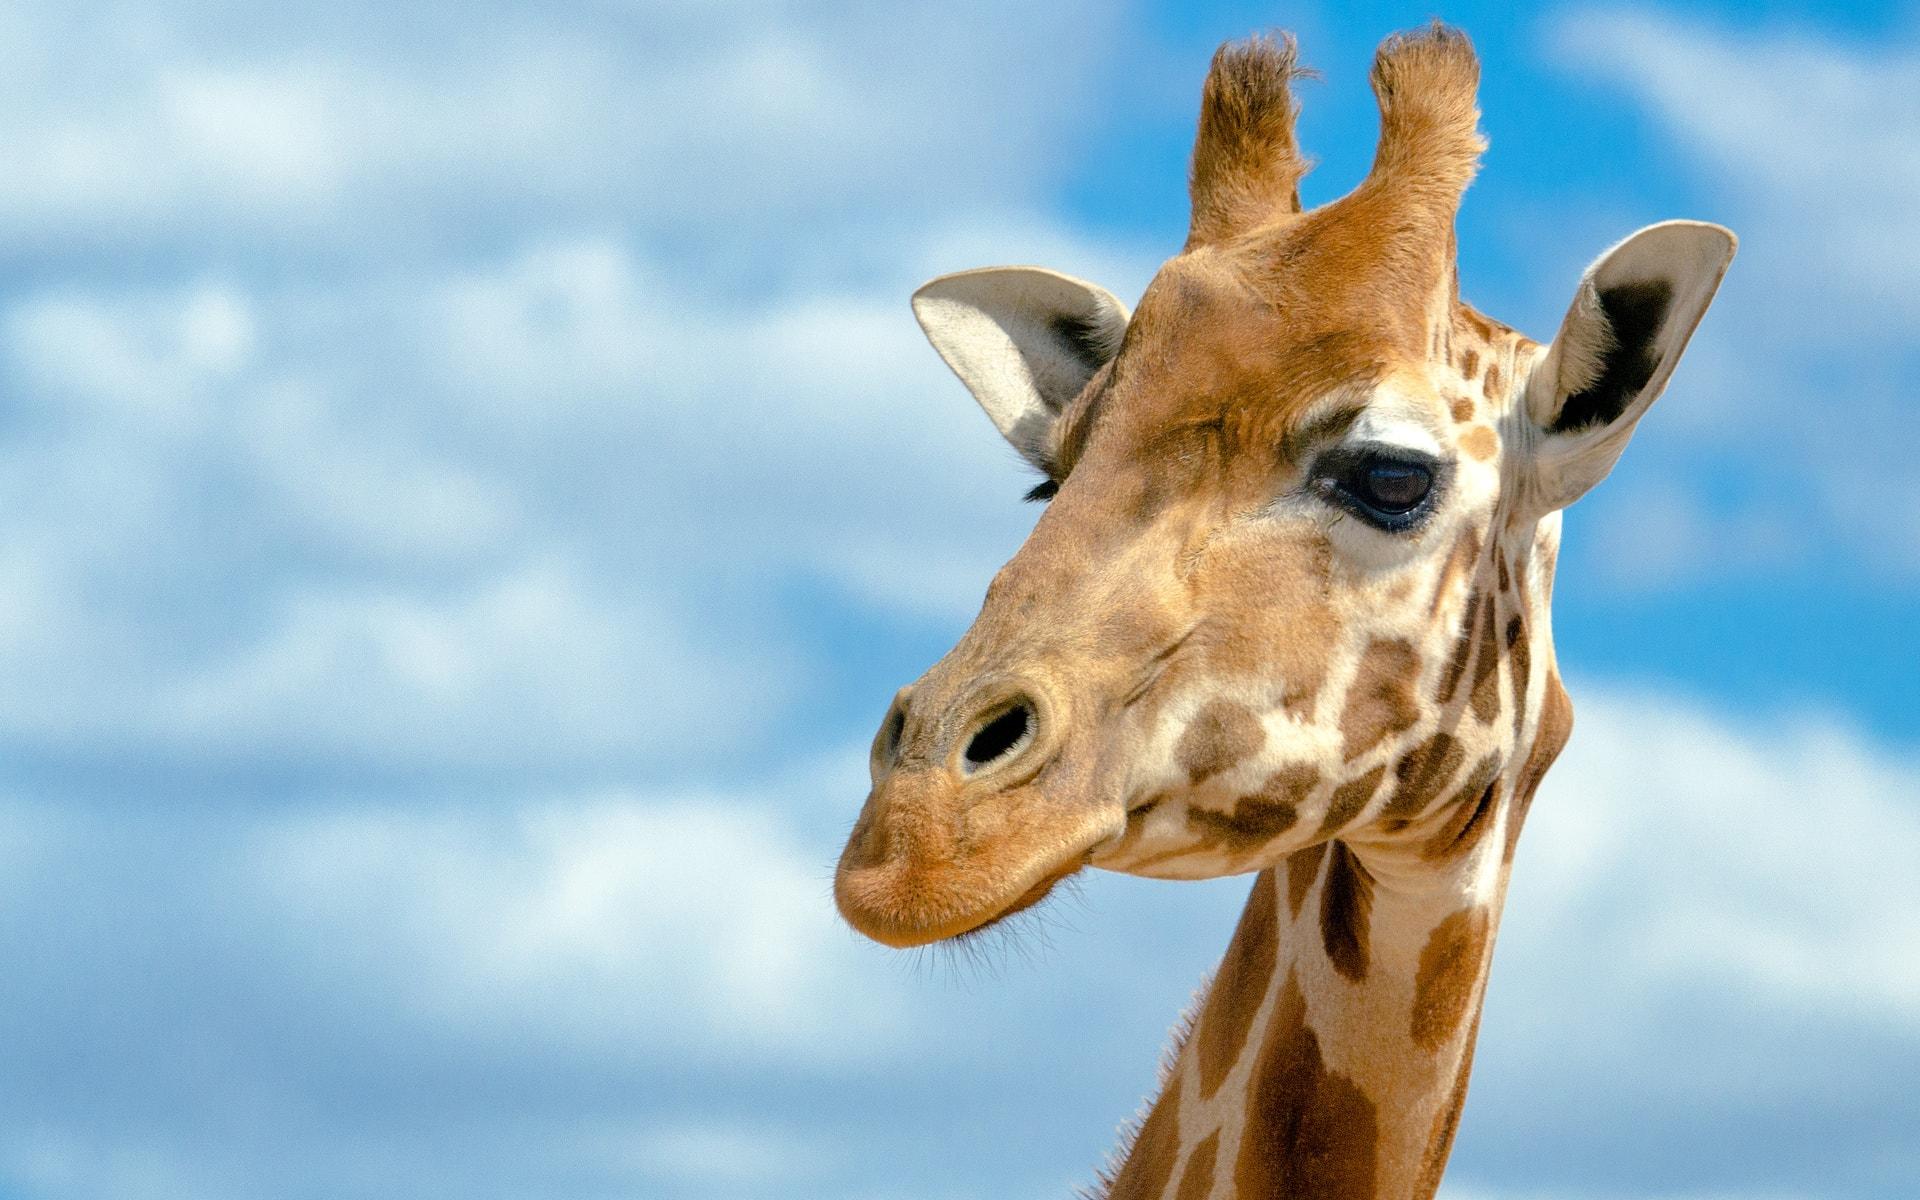 Giraffe HD pics